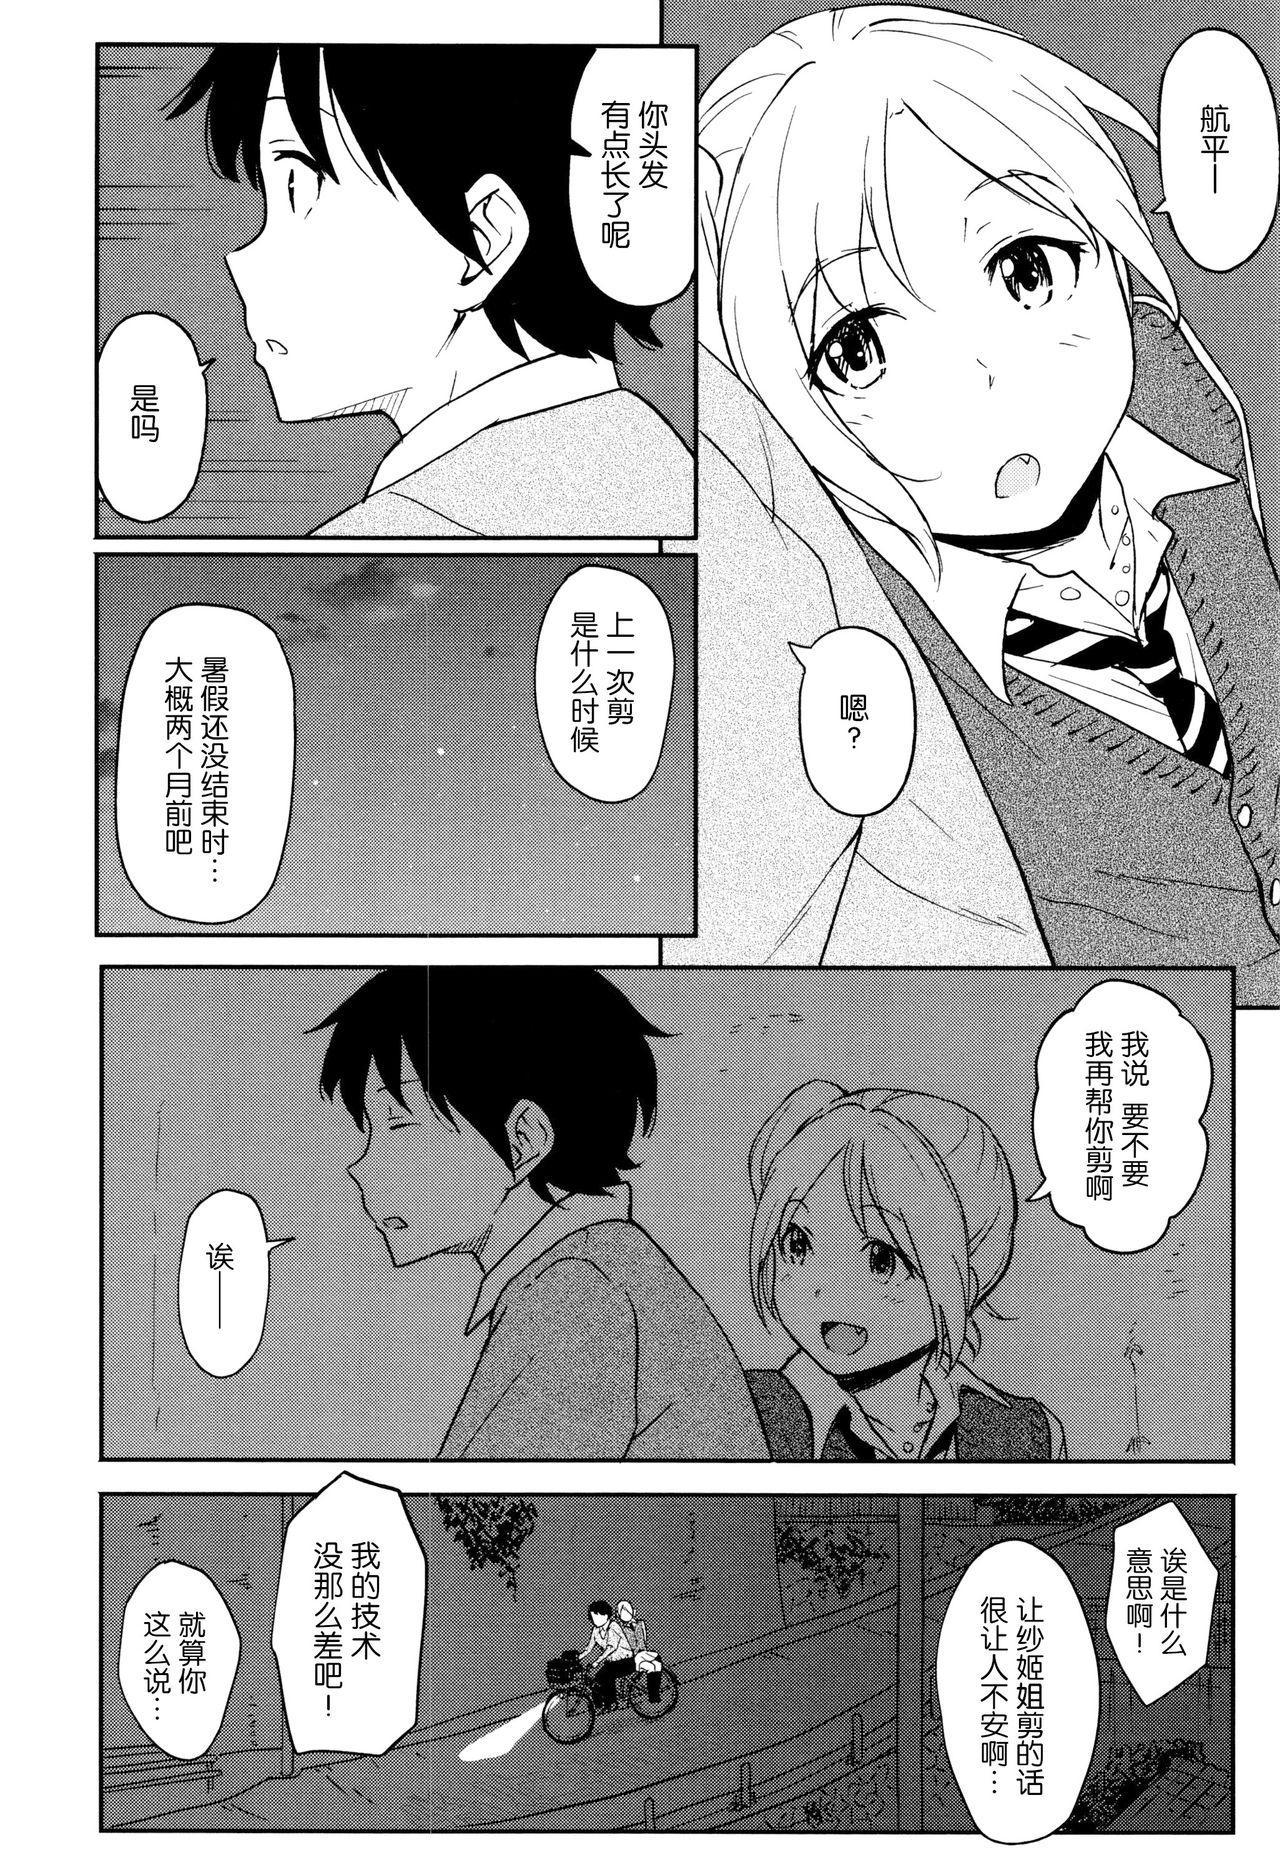 Tokubetsu na Mainichi - Special daily 48